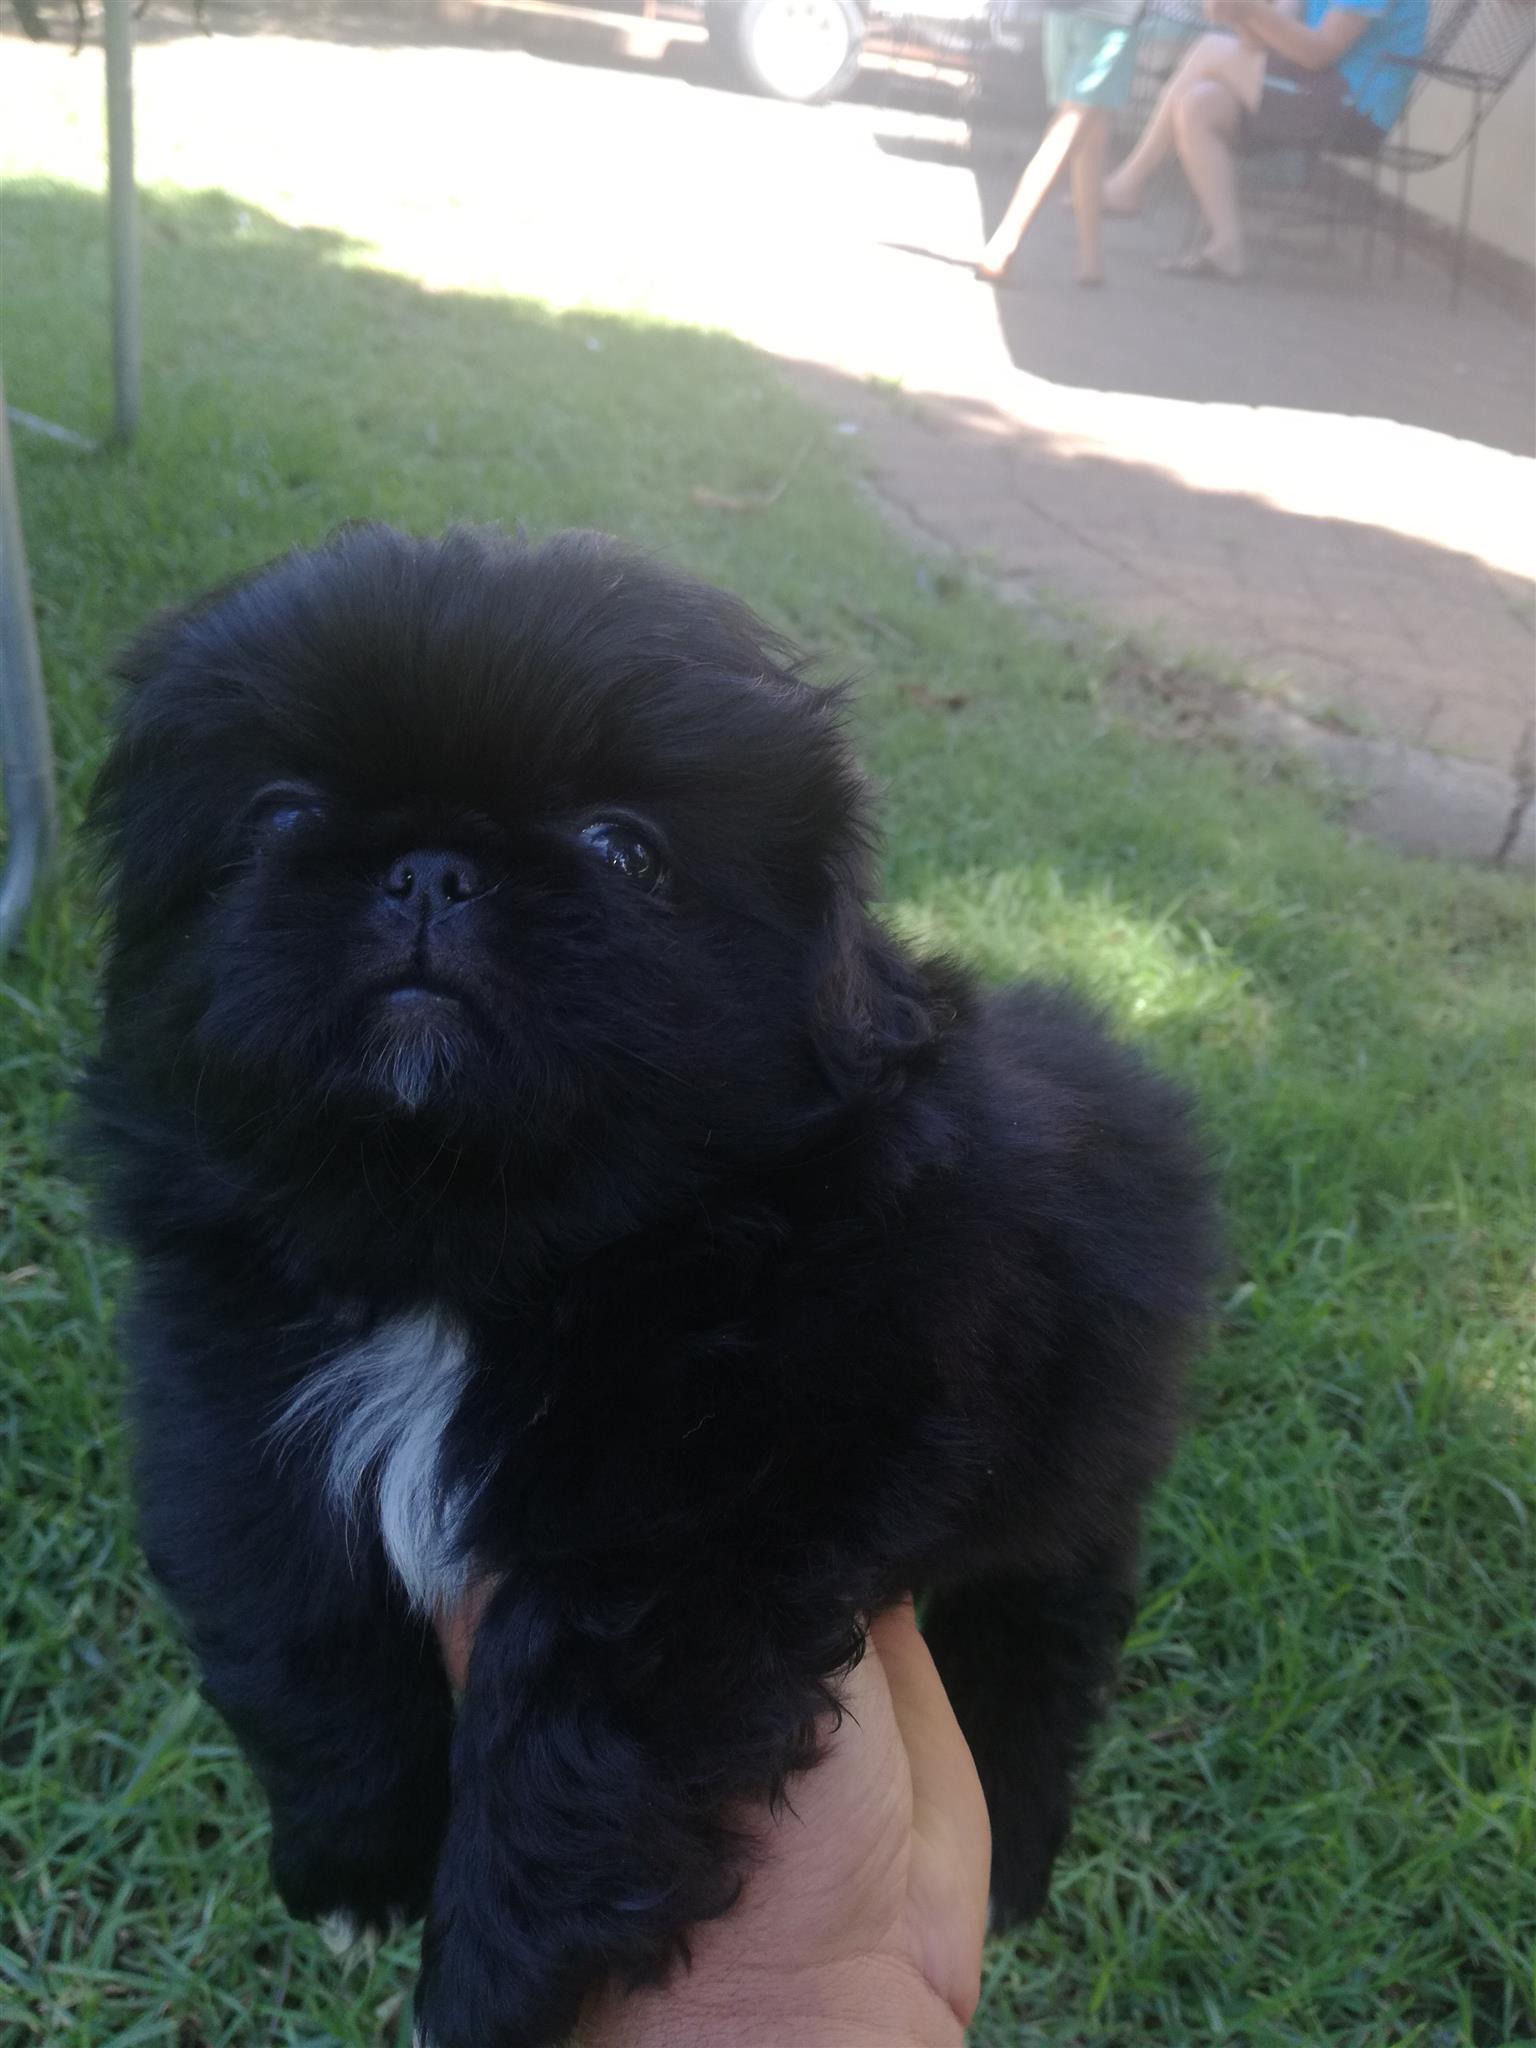 Purebred pekingese puppies for sale in Springs/Gauteng